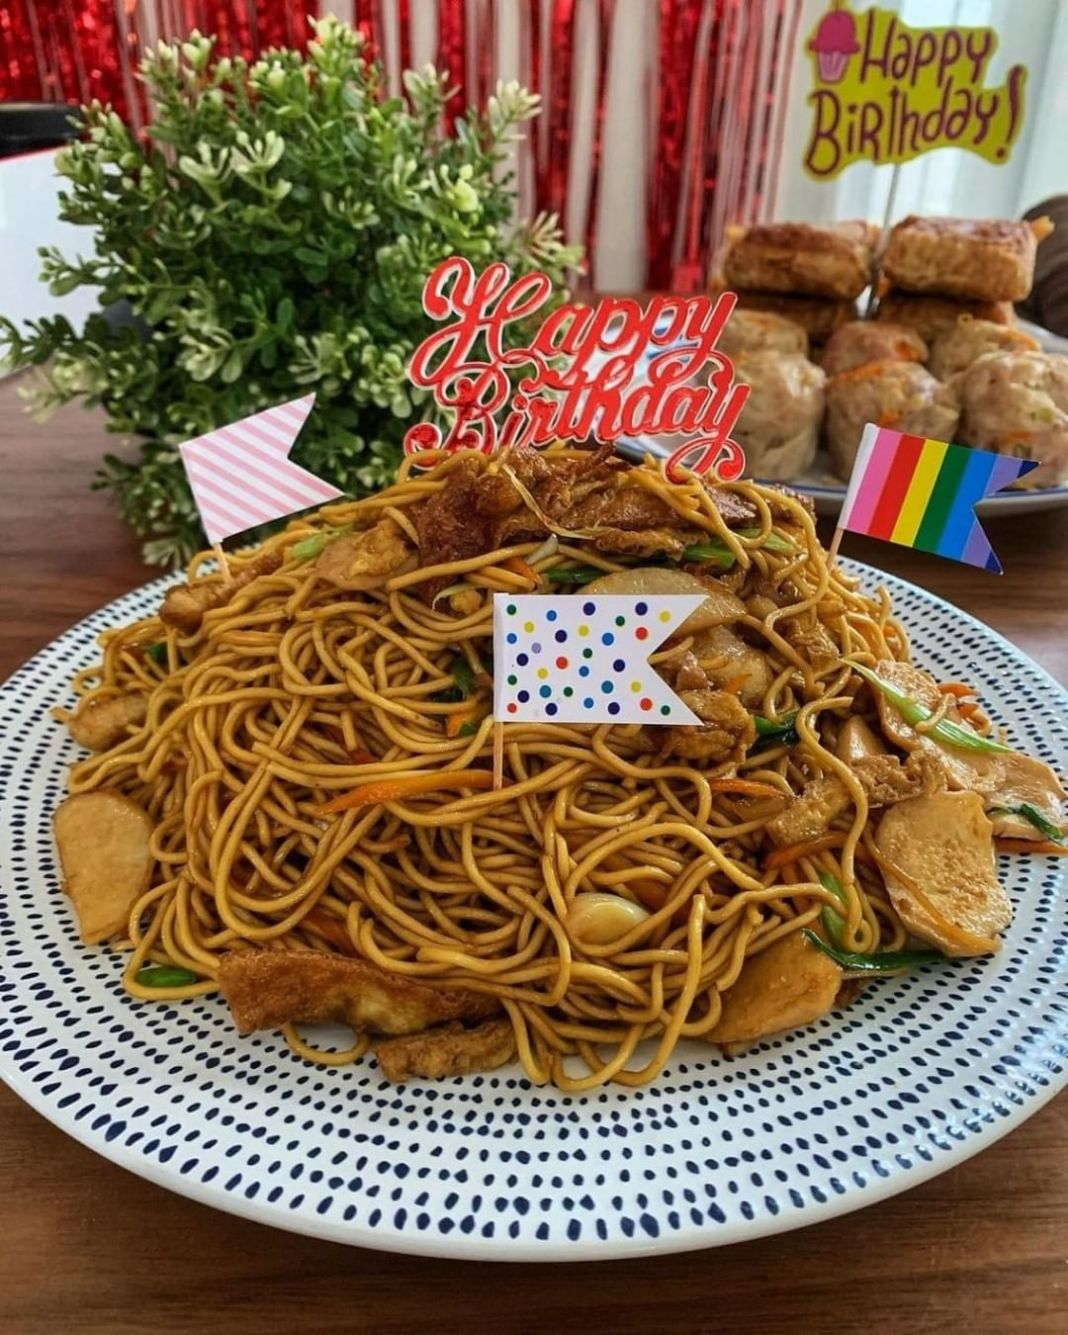 Info kuliner, Mie Ulang Tahun  setiap keluarga dirumah yg berulang tahun pasti Saya masak Mie ulang Tahun yang…